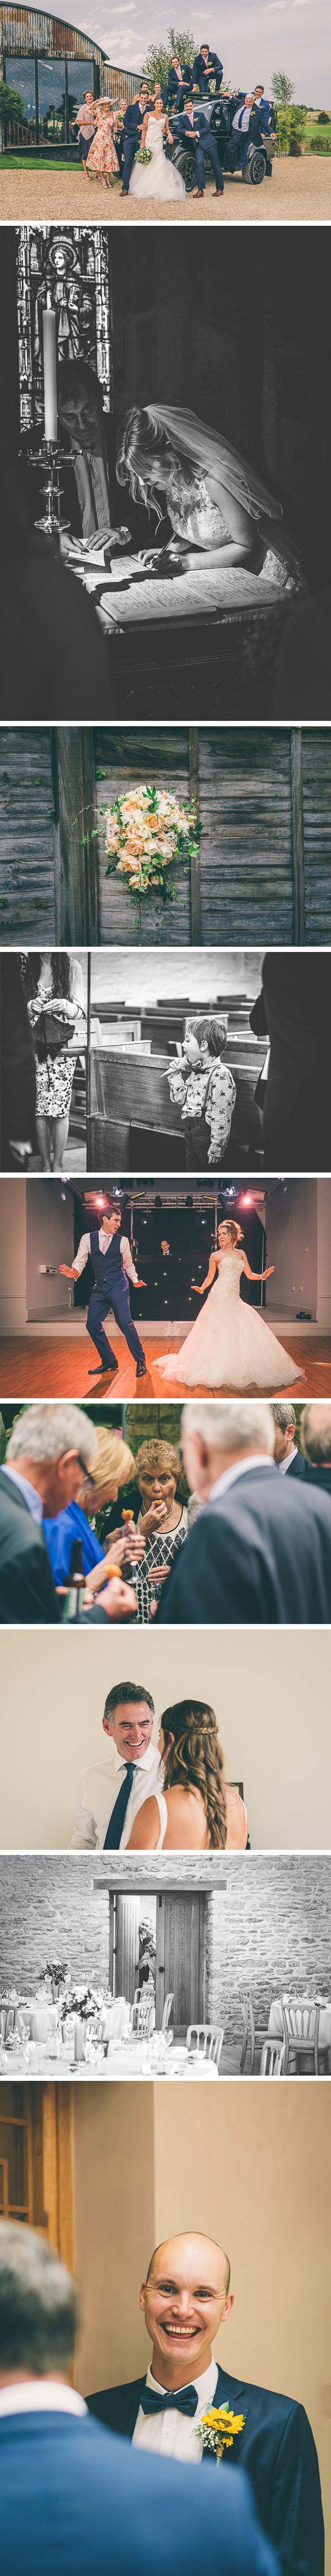 First Dance at Wedding Photos